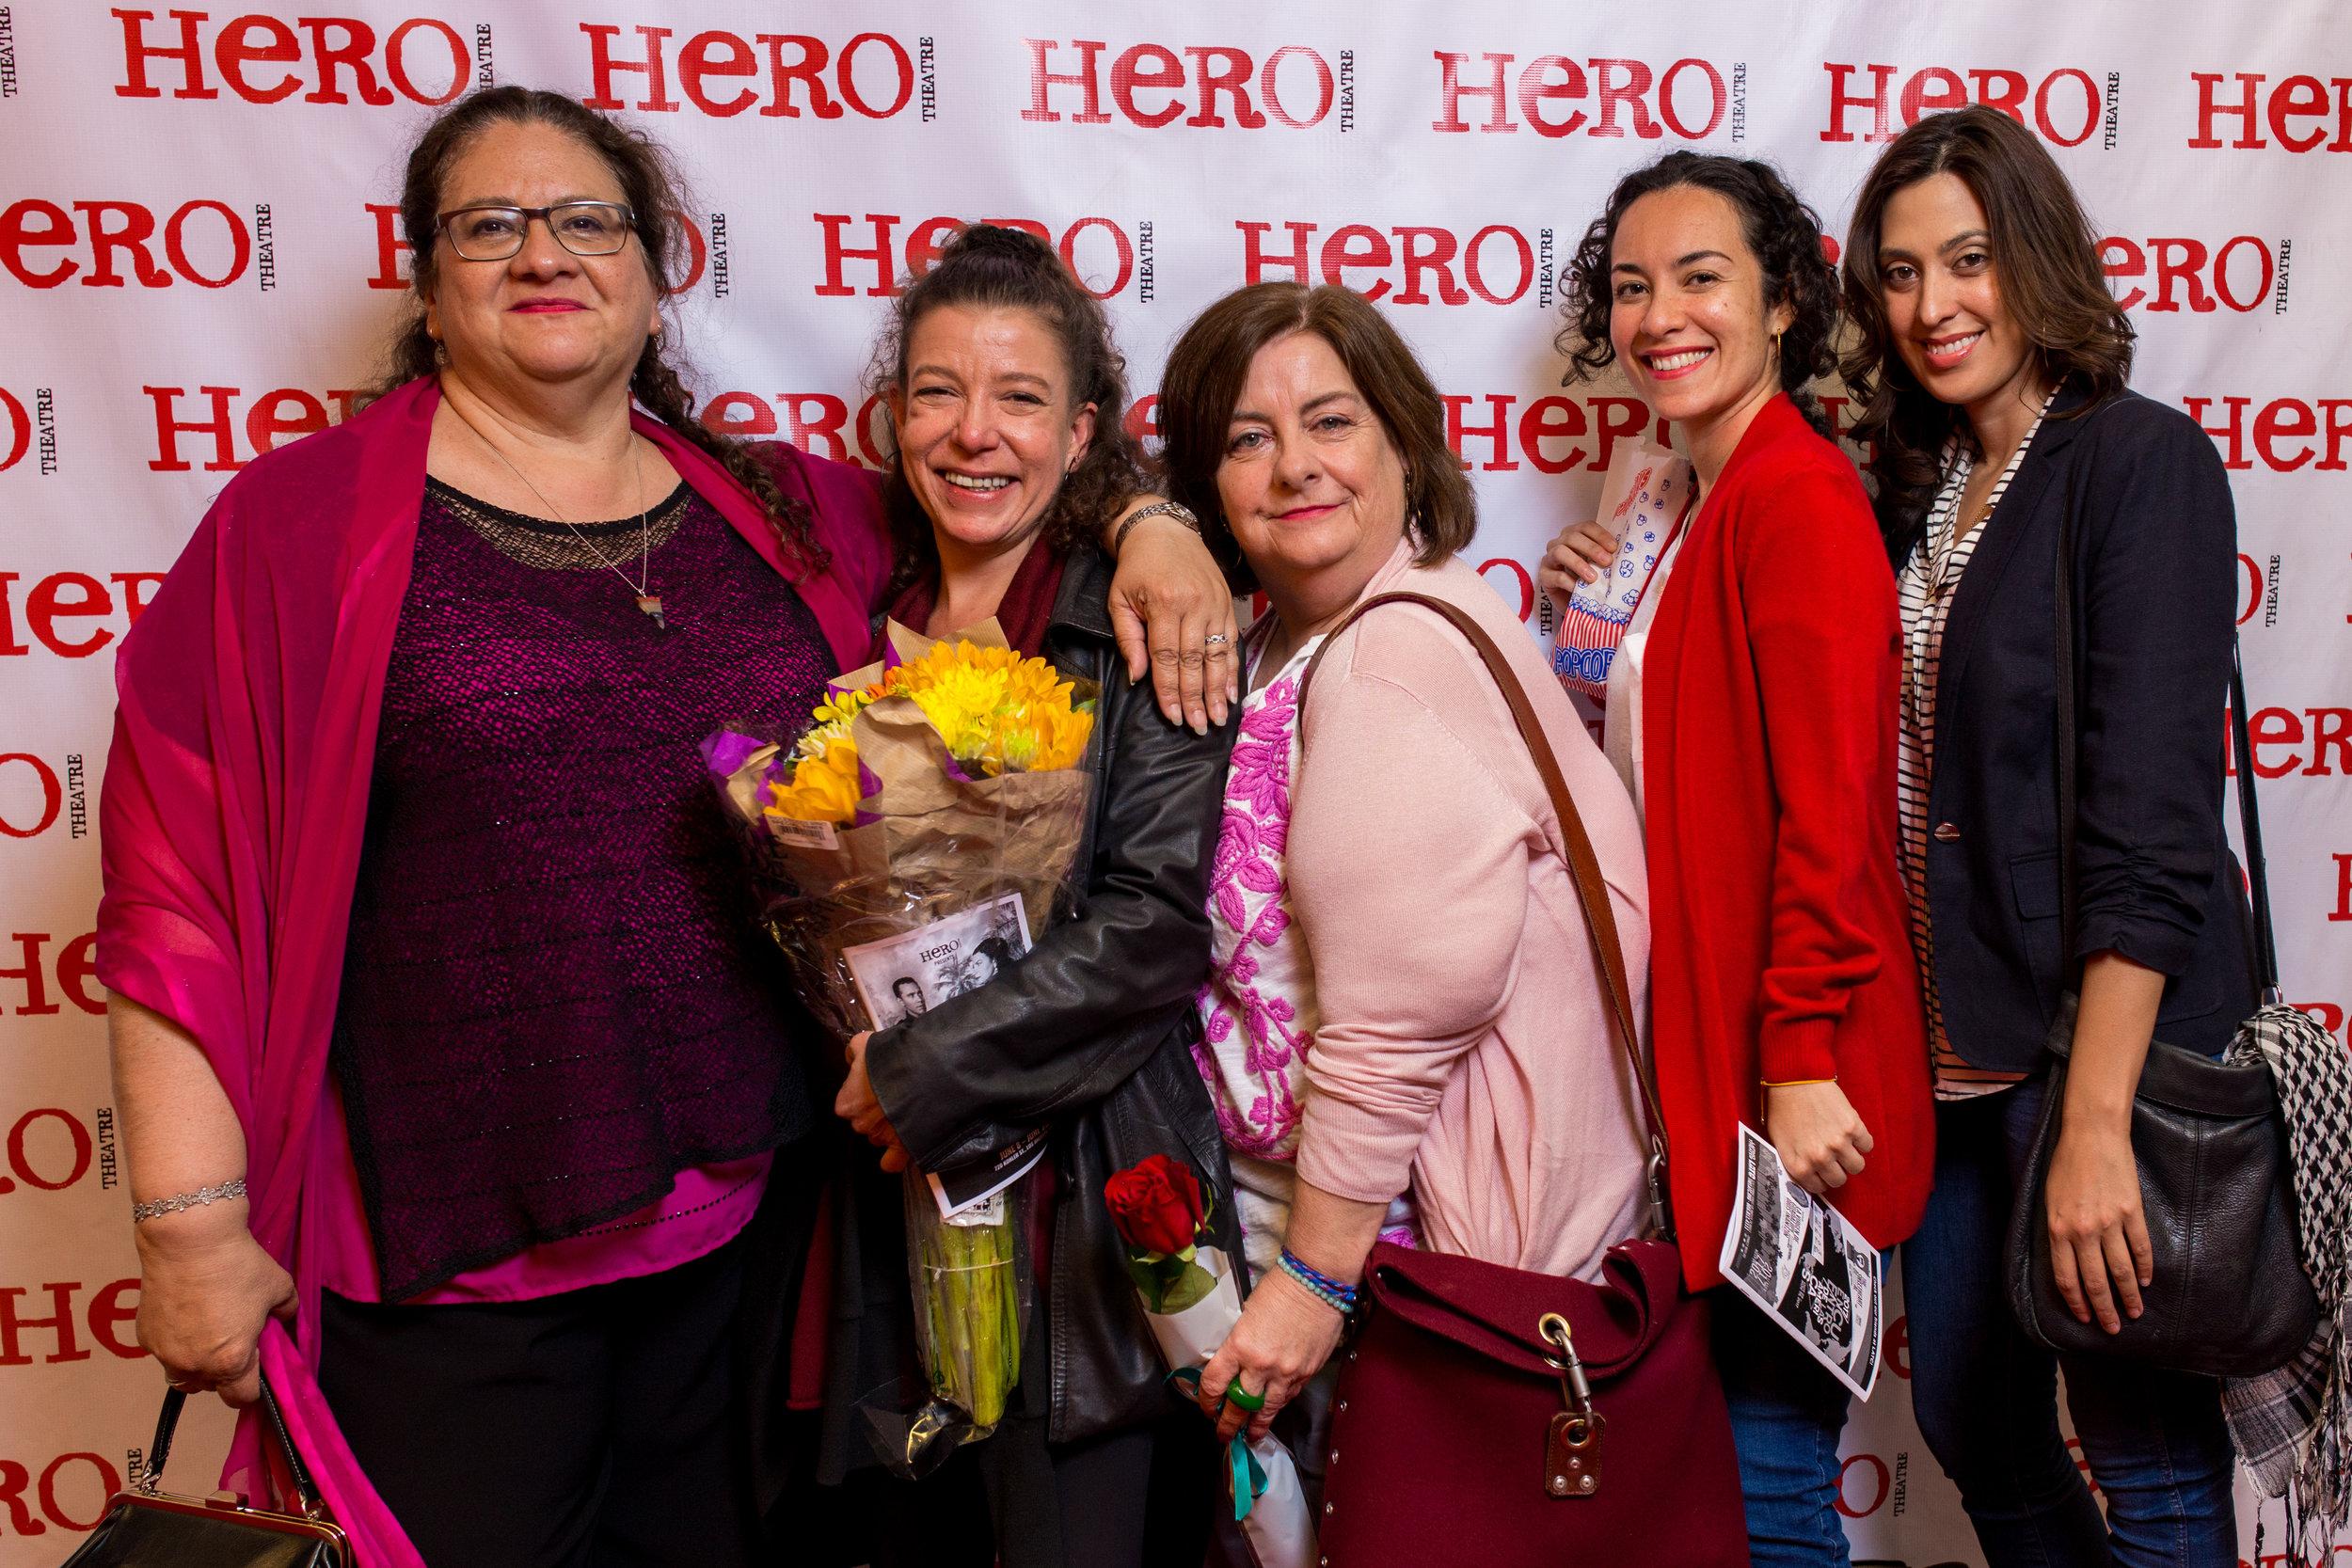 Hero-Theater-Final_17-06-11-0089.jpg